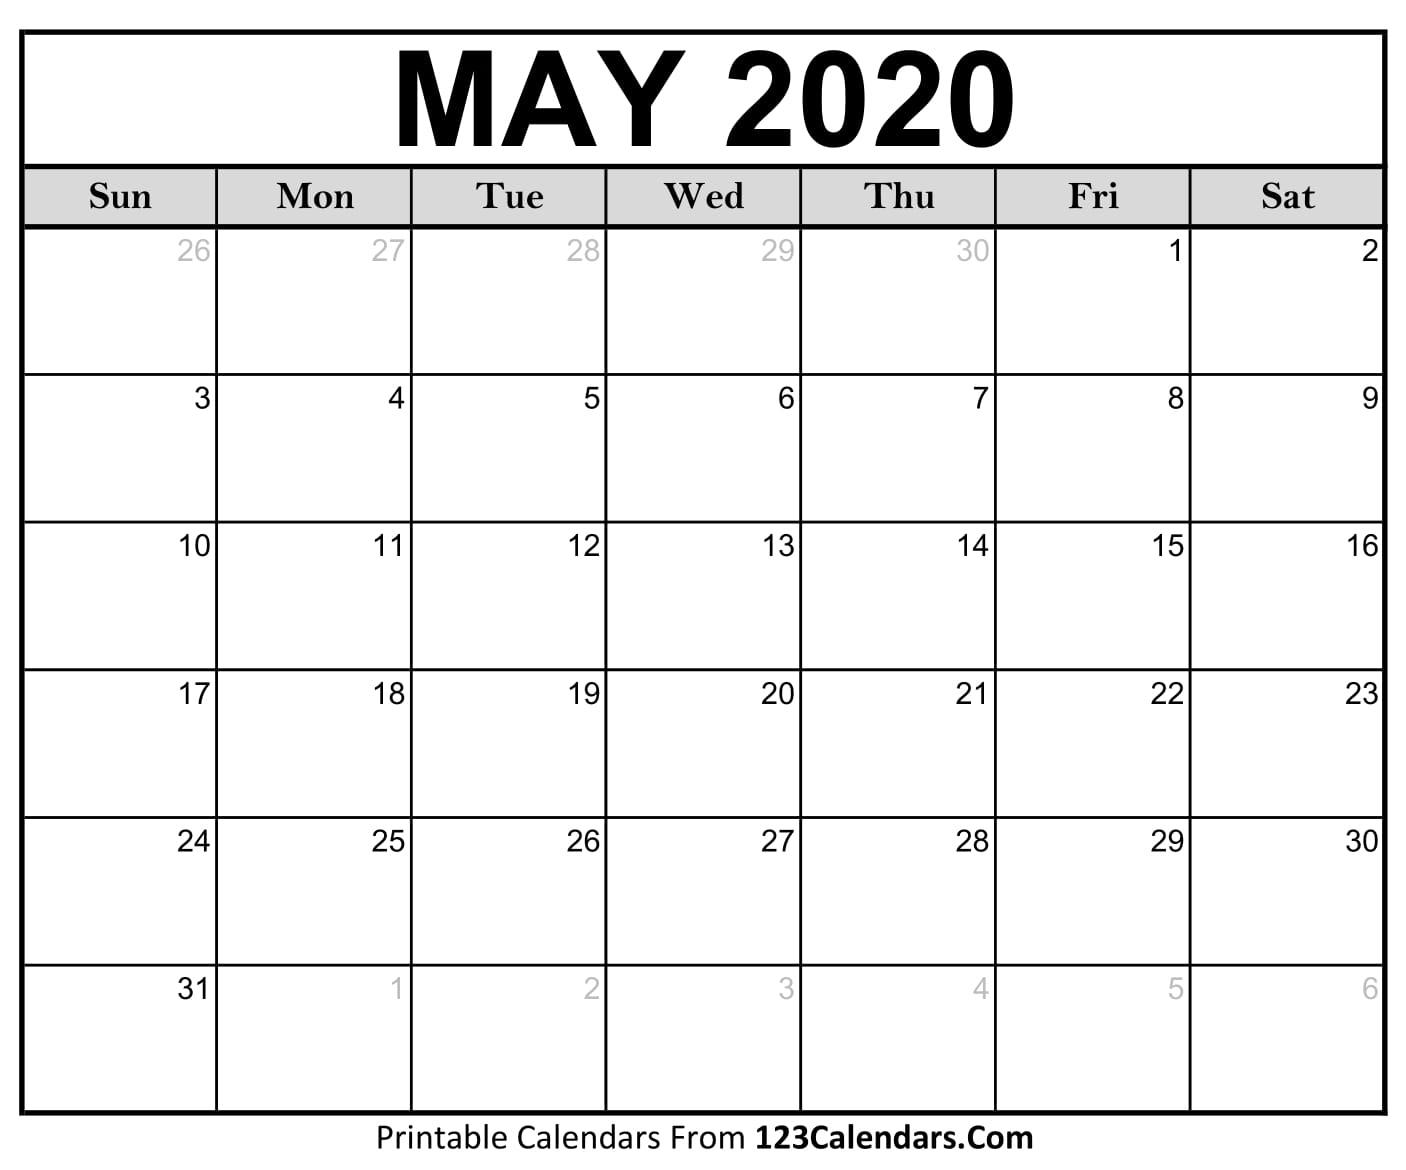 May 2020 Printable Calendar   123Calendars